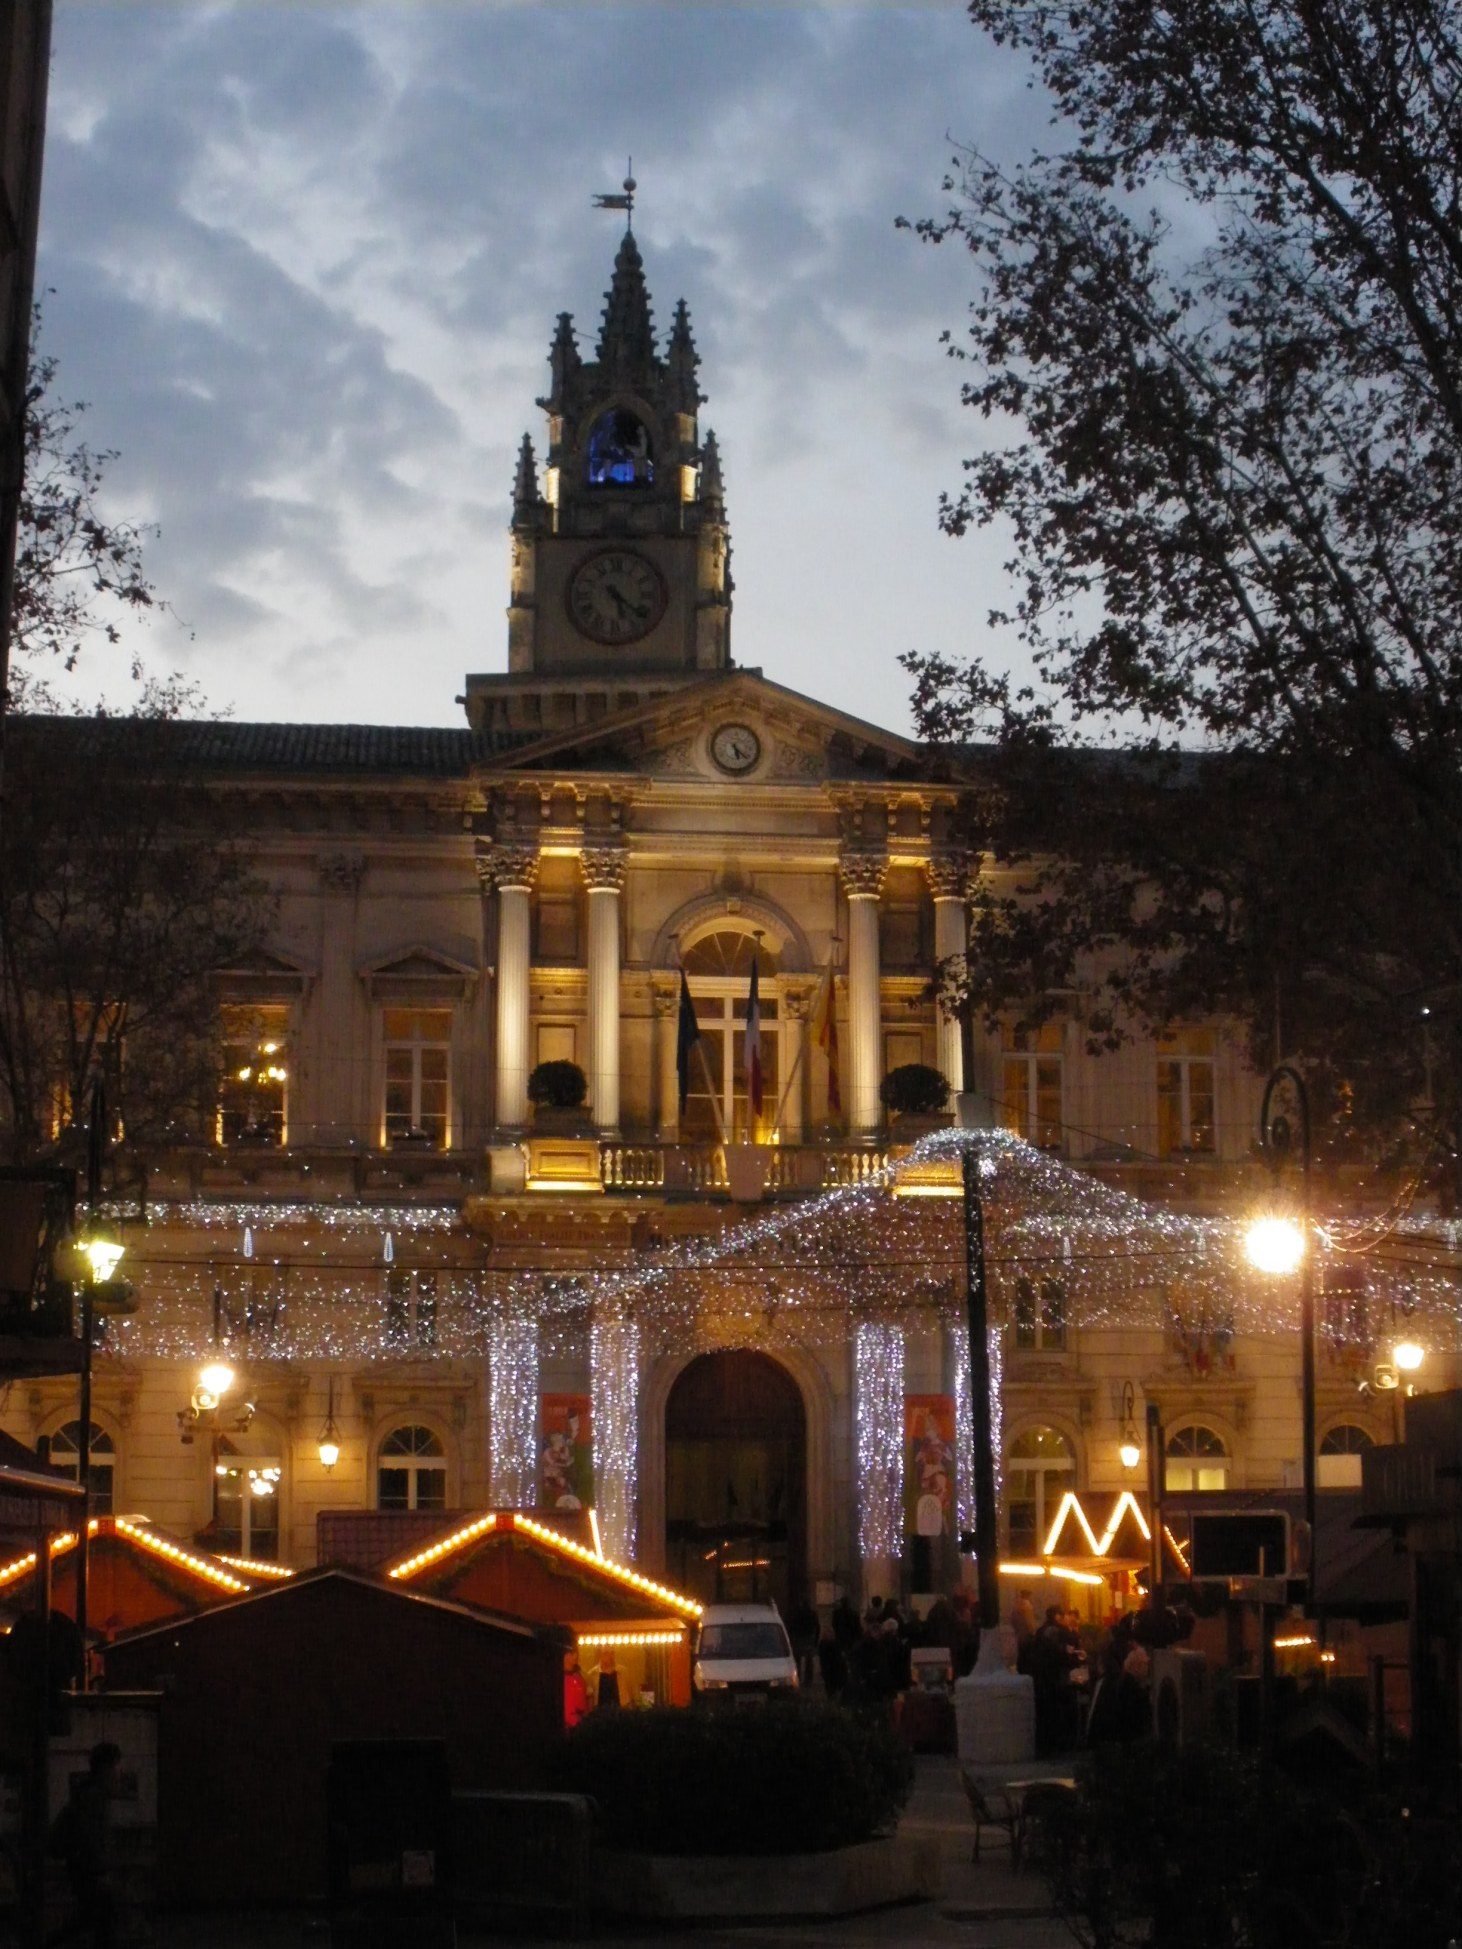 Les marchés de Noël en Provence